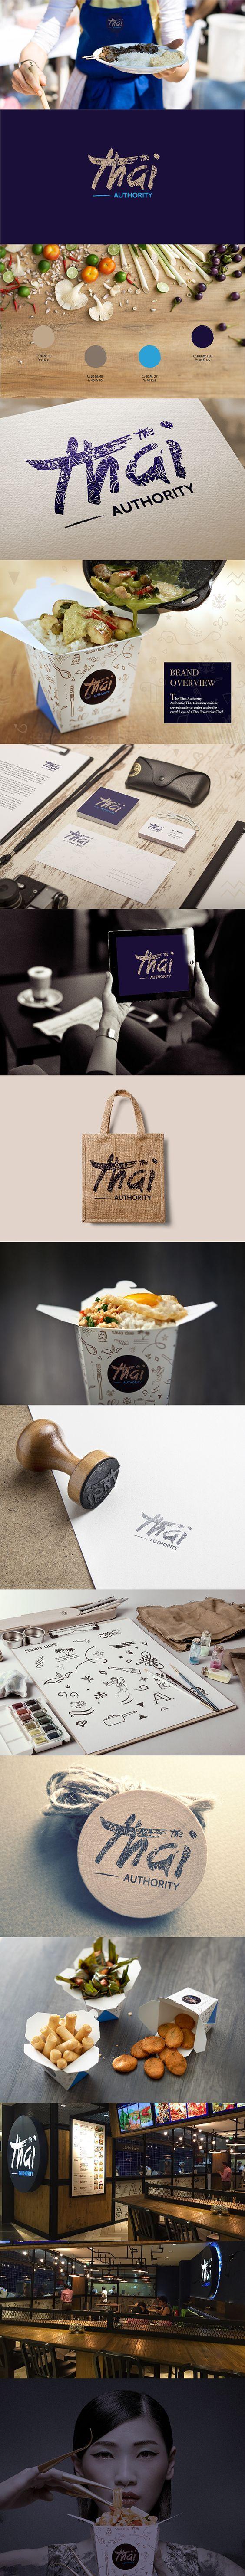 Thai Authority Restaurant on Behance by Agata Dondzik. I'm ready for Thai now PD: